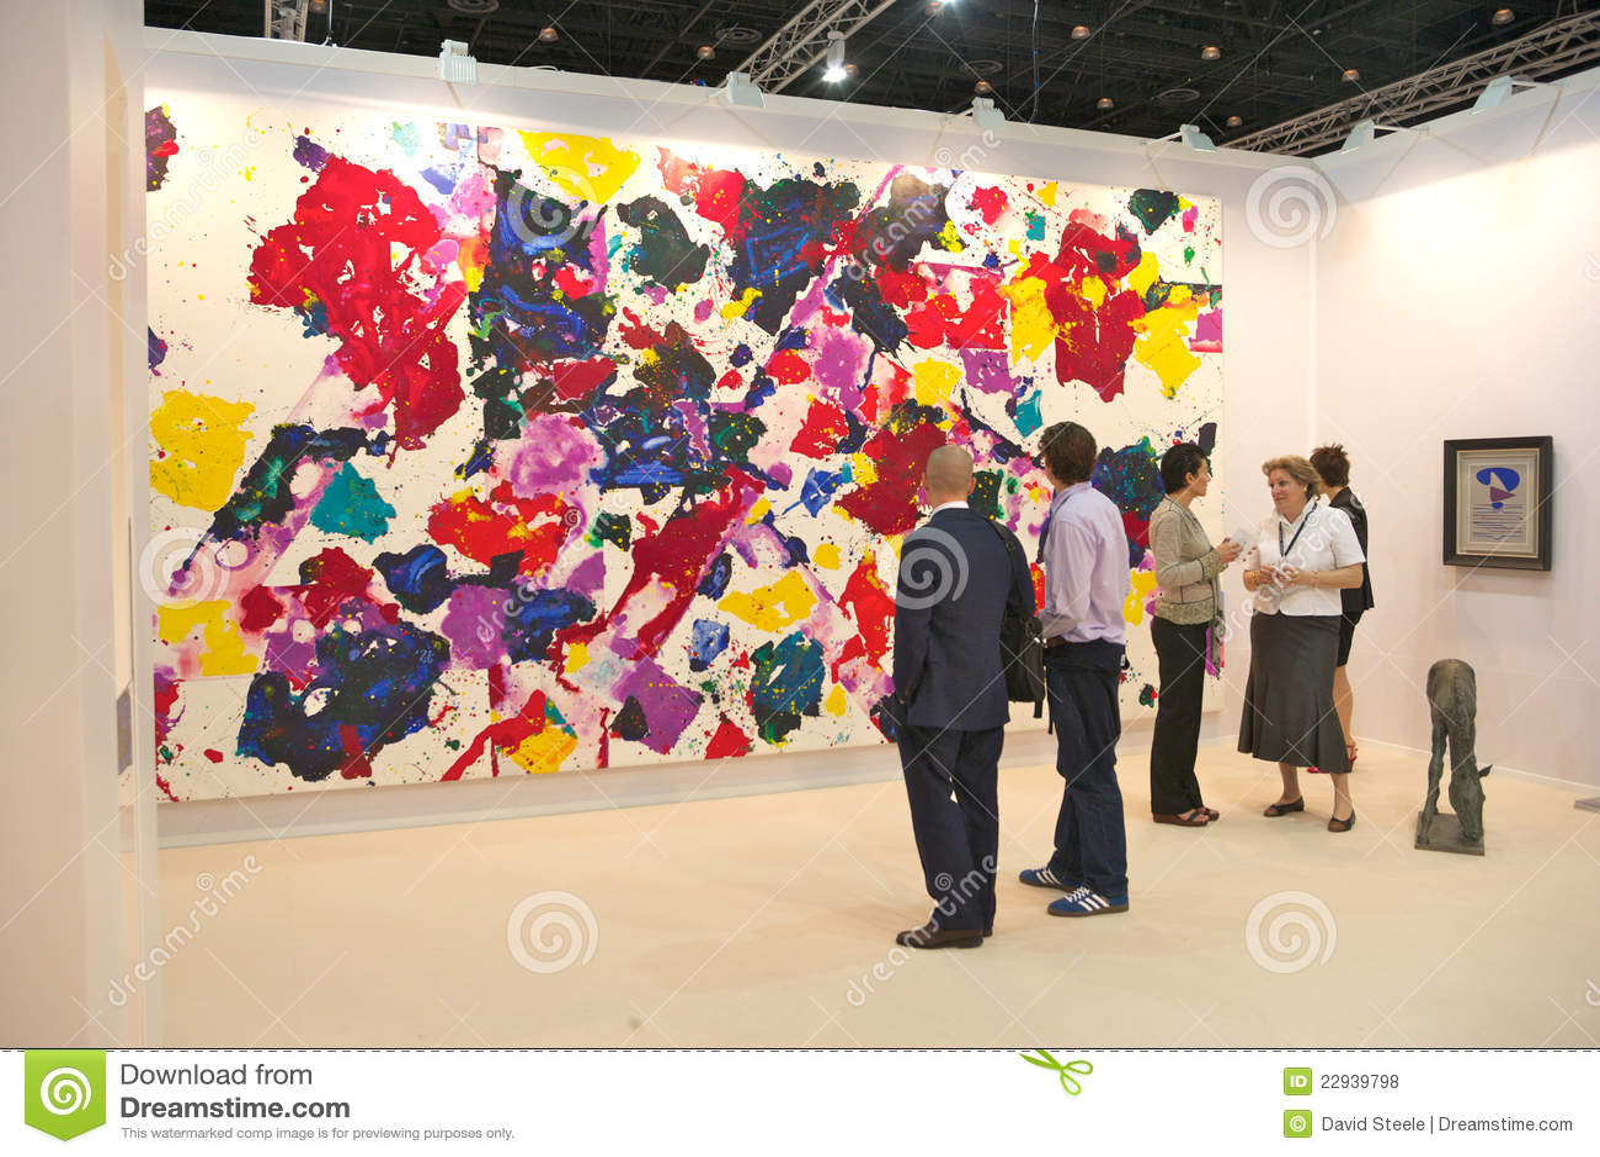 D Art Exhibition In Dubai : Art fairs chatterjee lal